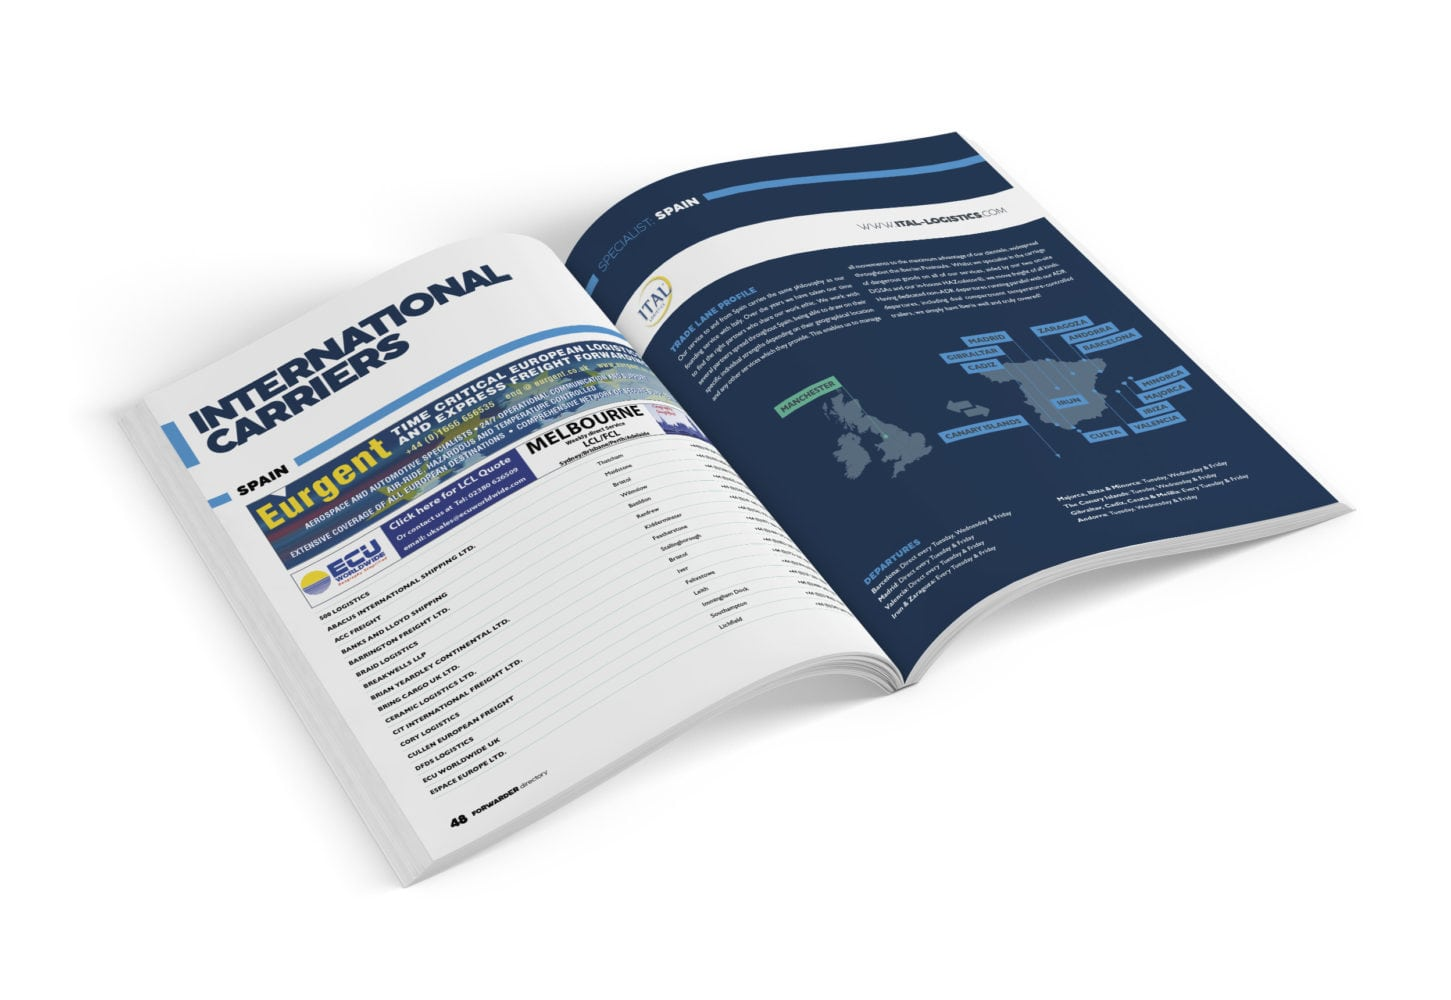 International directory | FORWARDER magazine